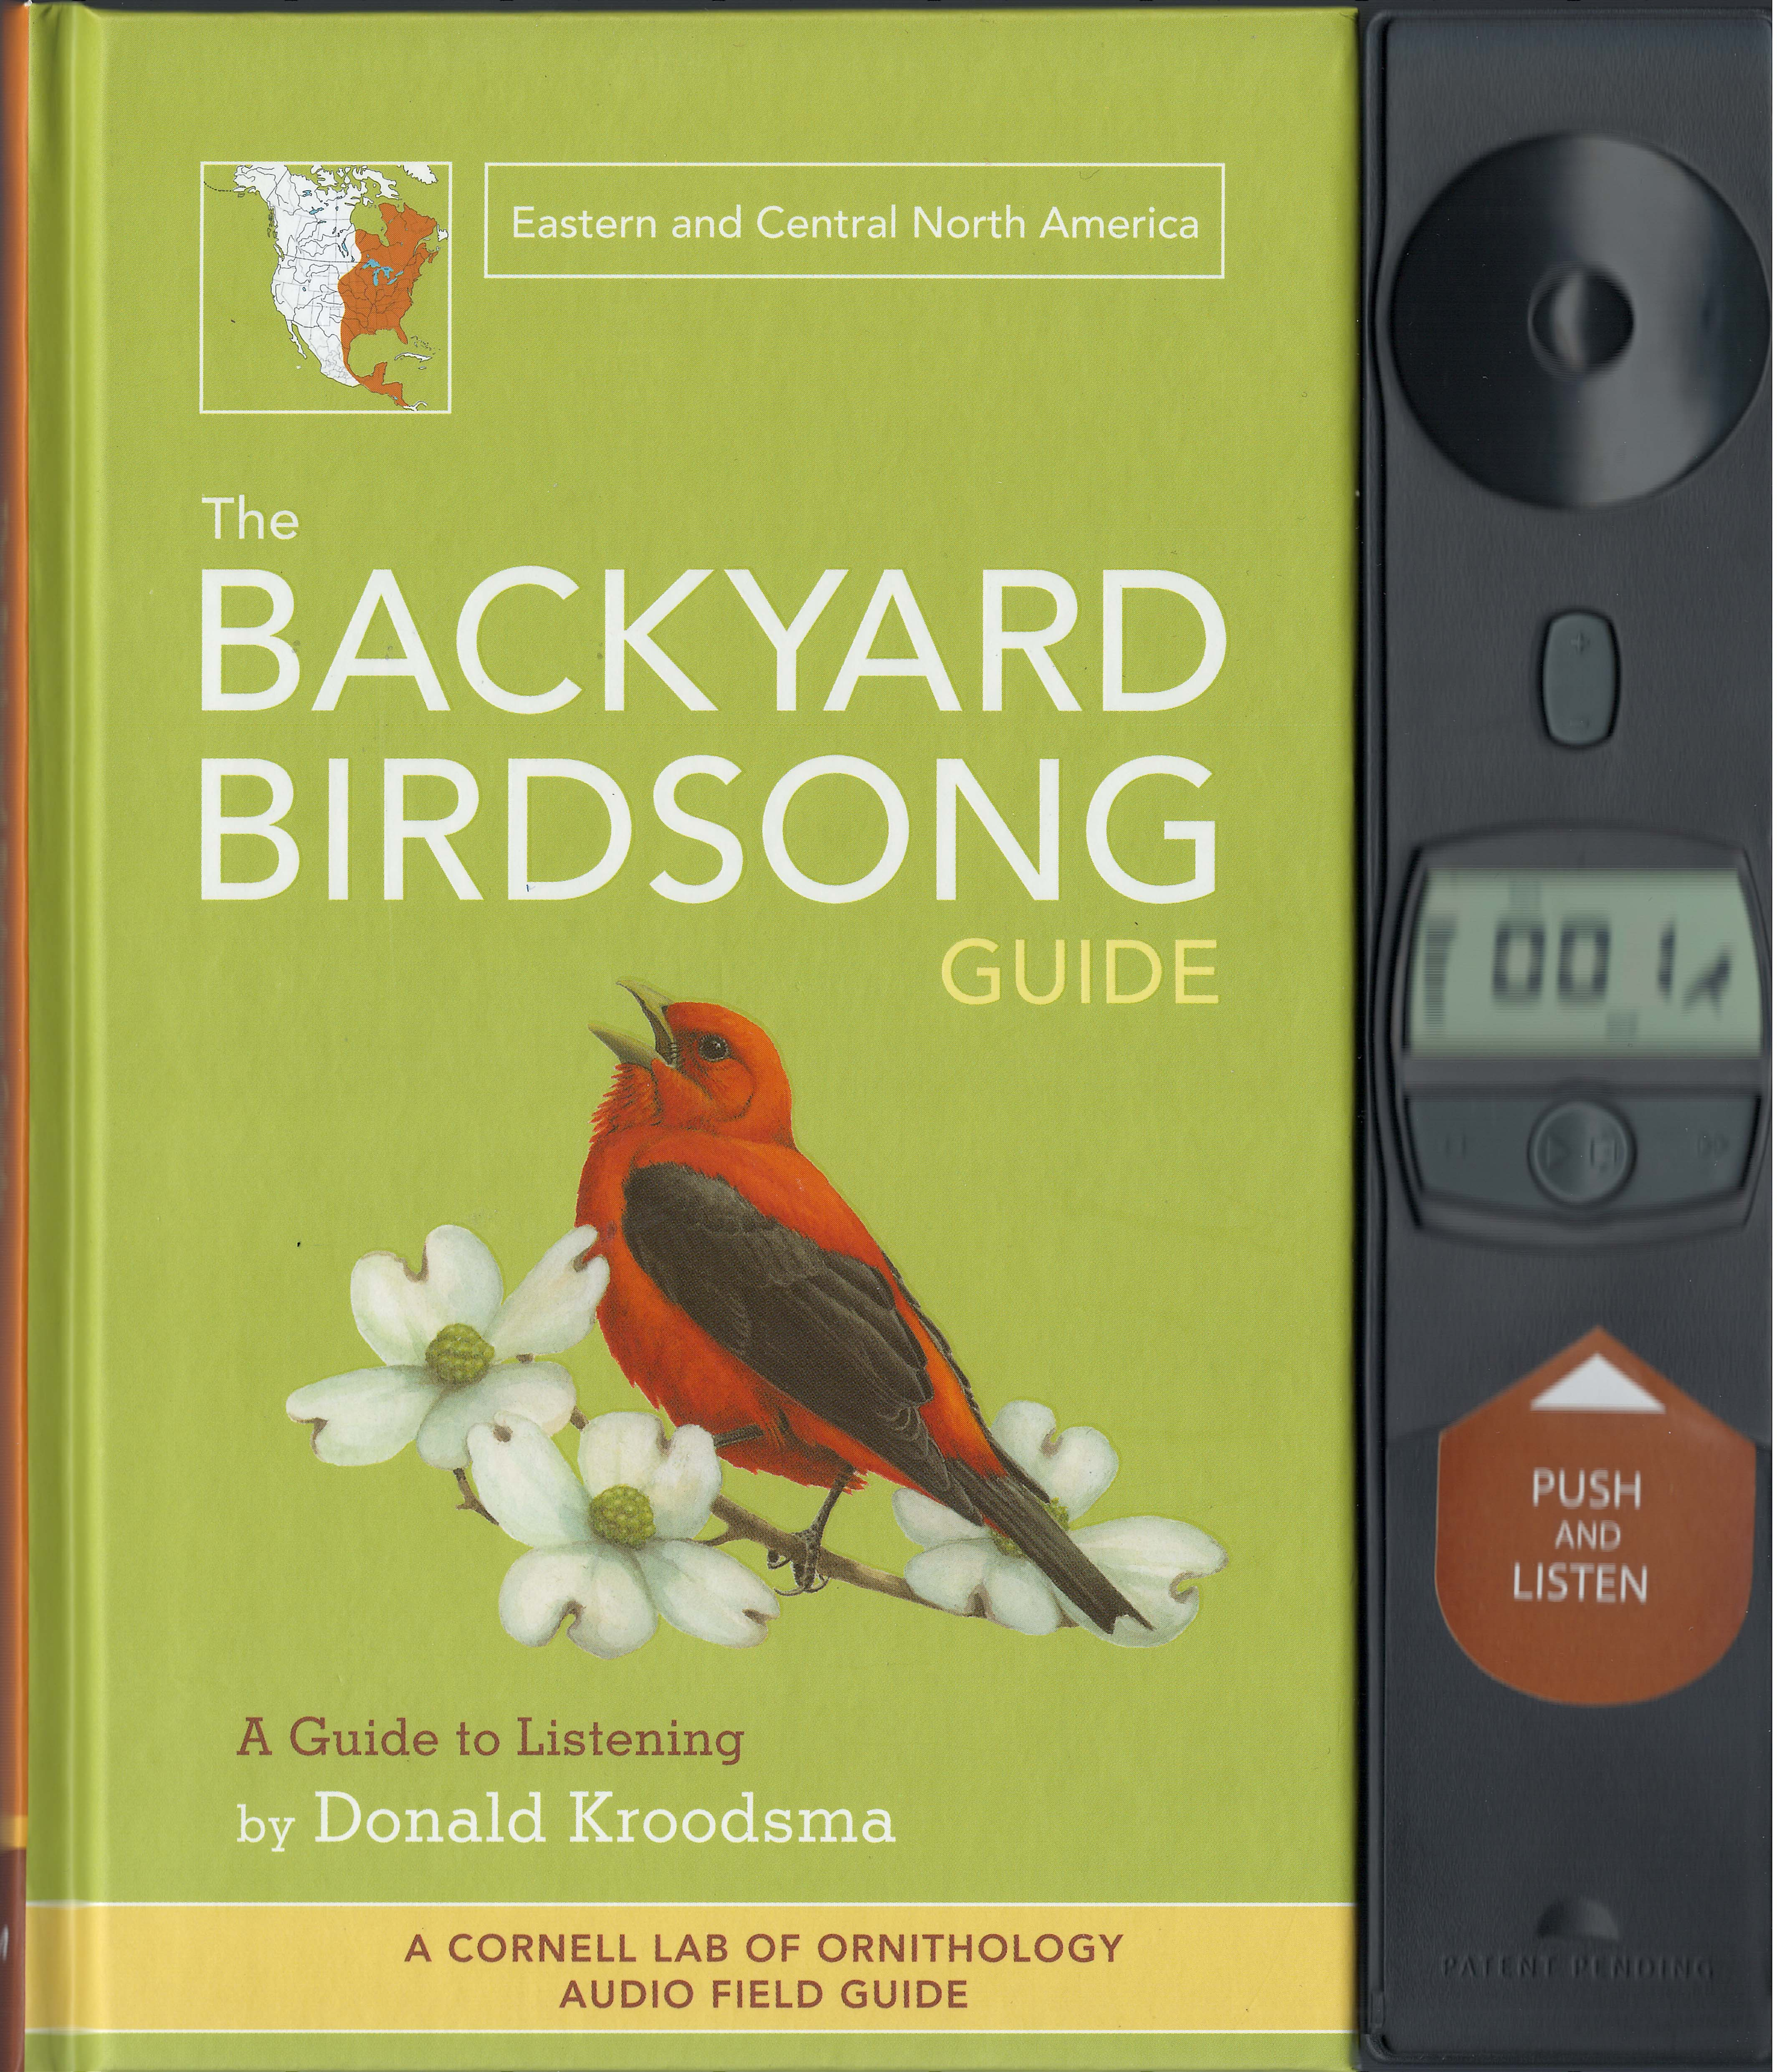 Backyard Birdsong Guides